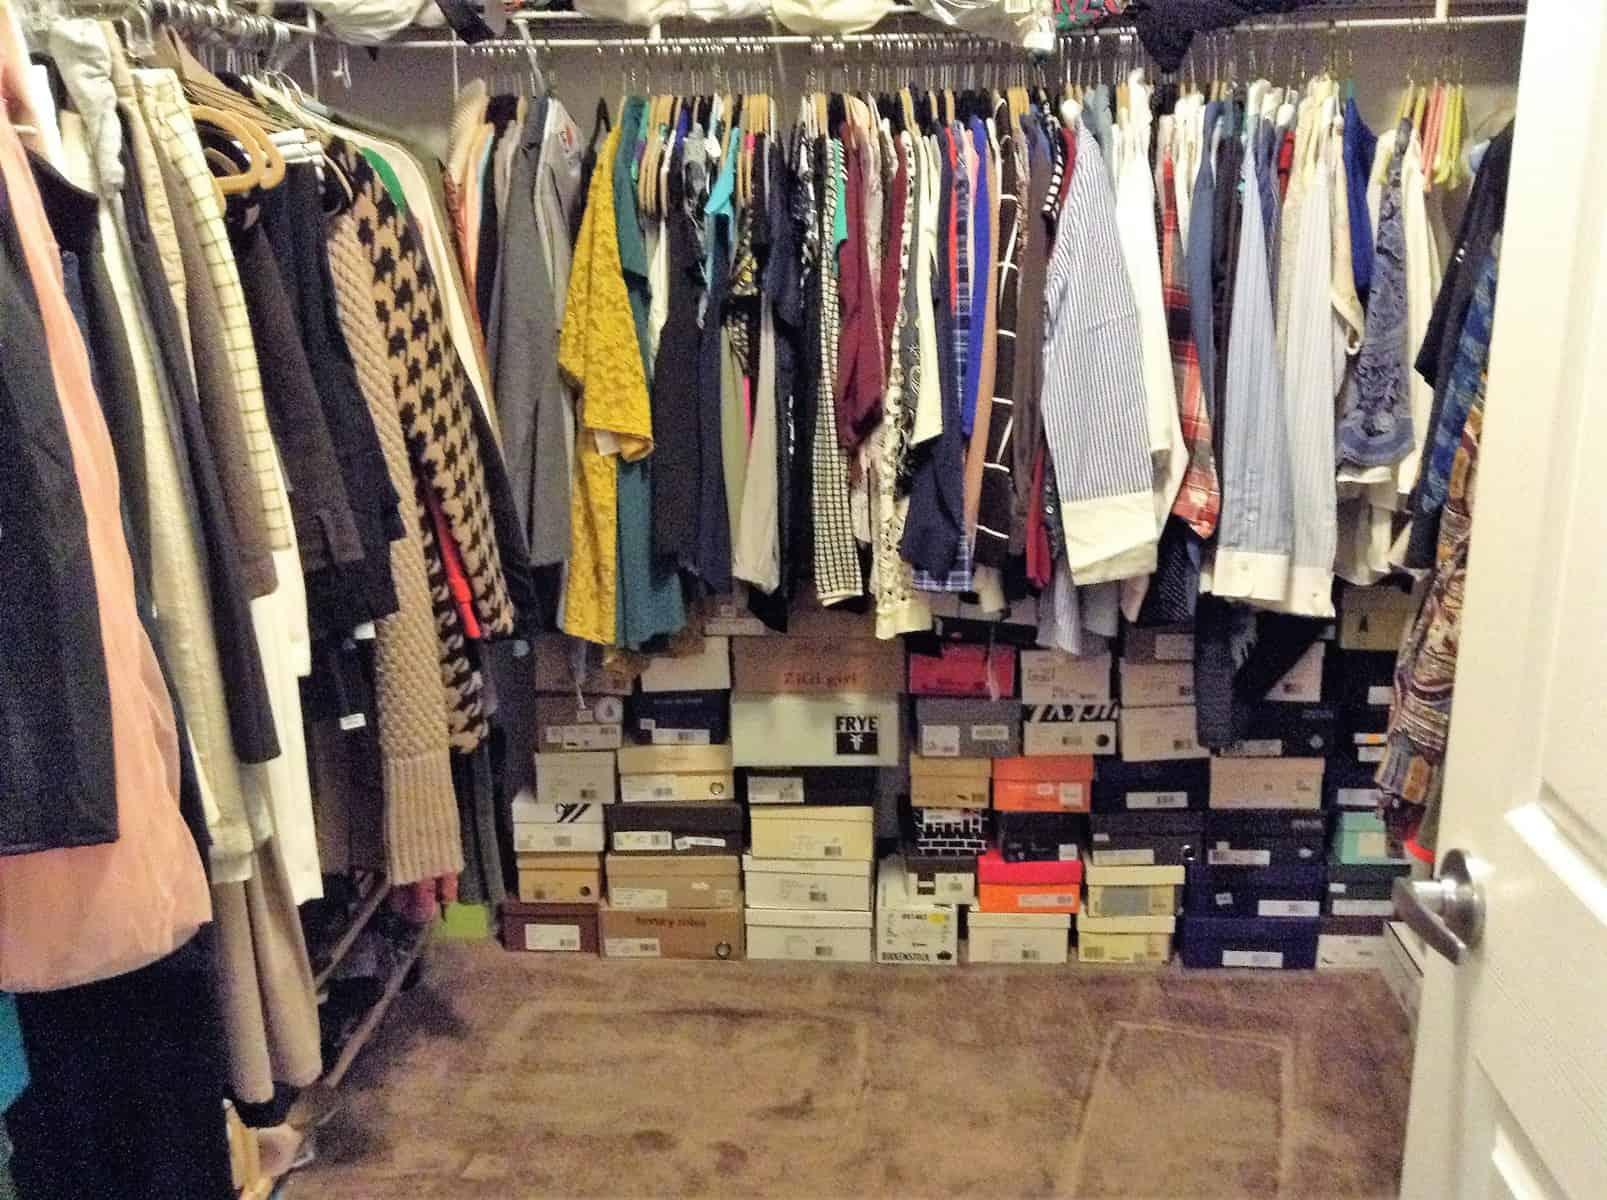 organization your organize closet organizing vetta blogs blog shutterstock tips